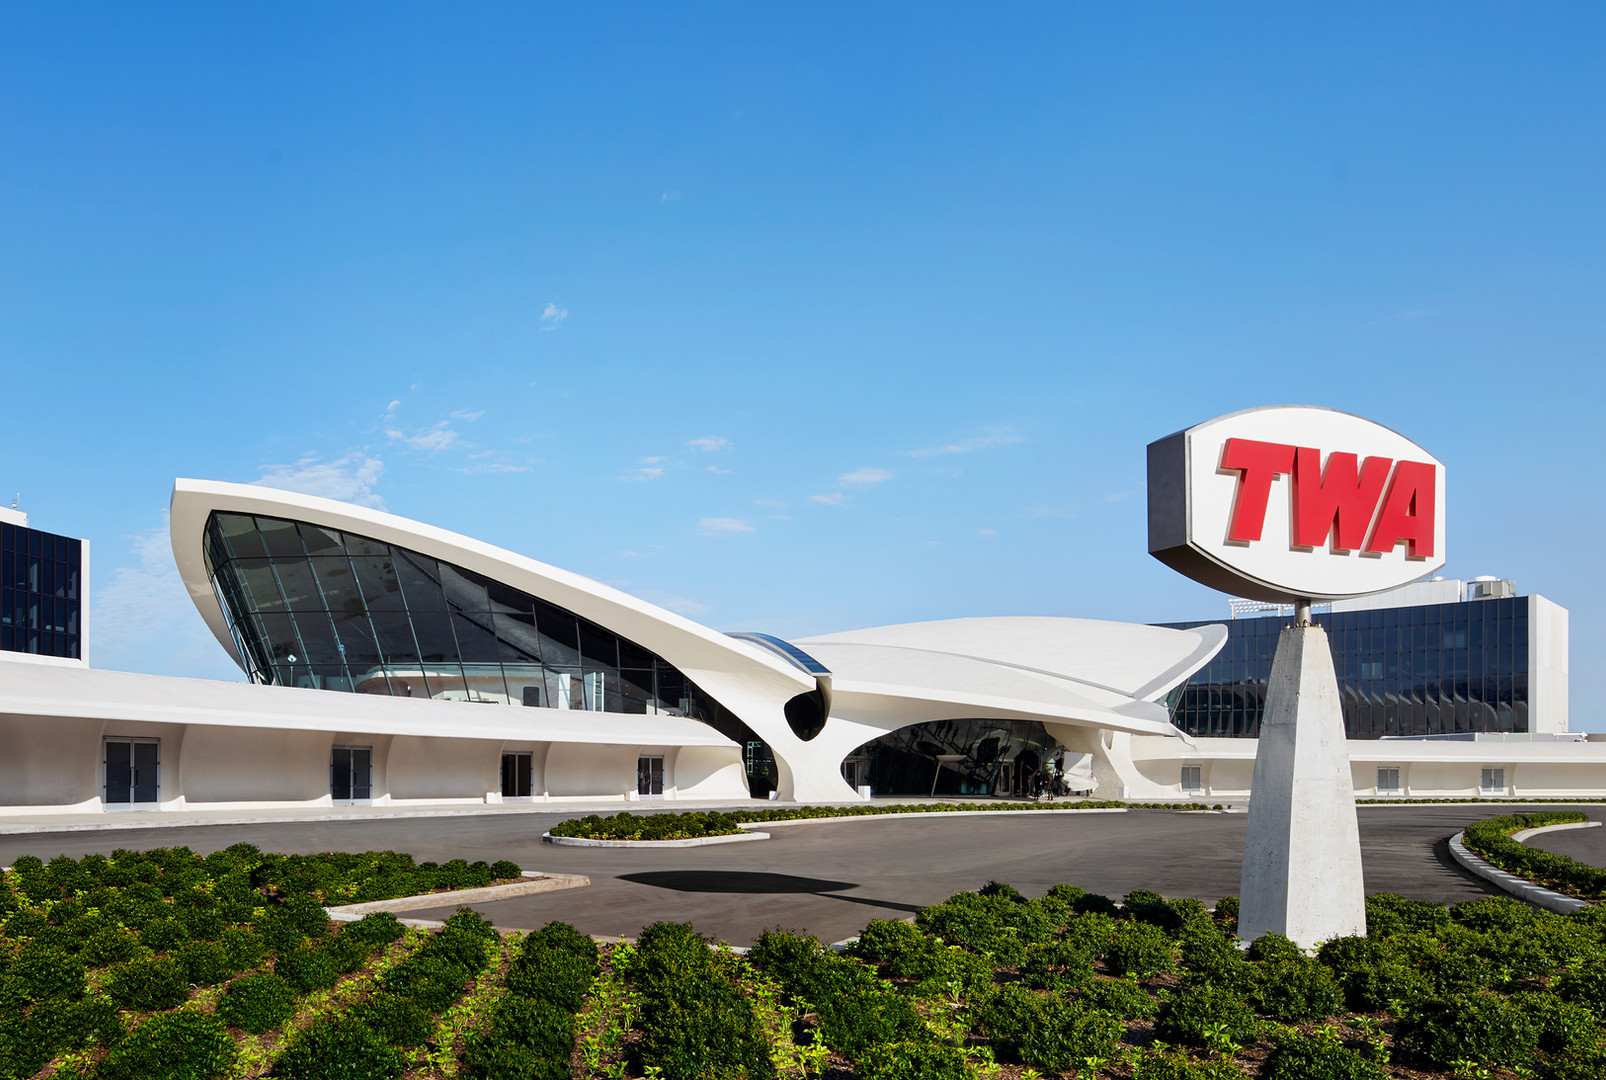 Half a Century Later, The TWA Hotel